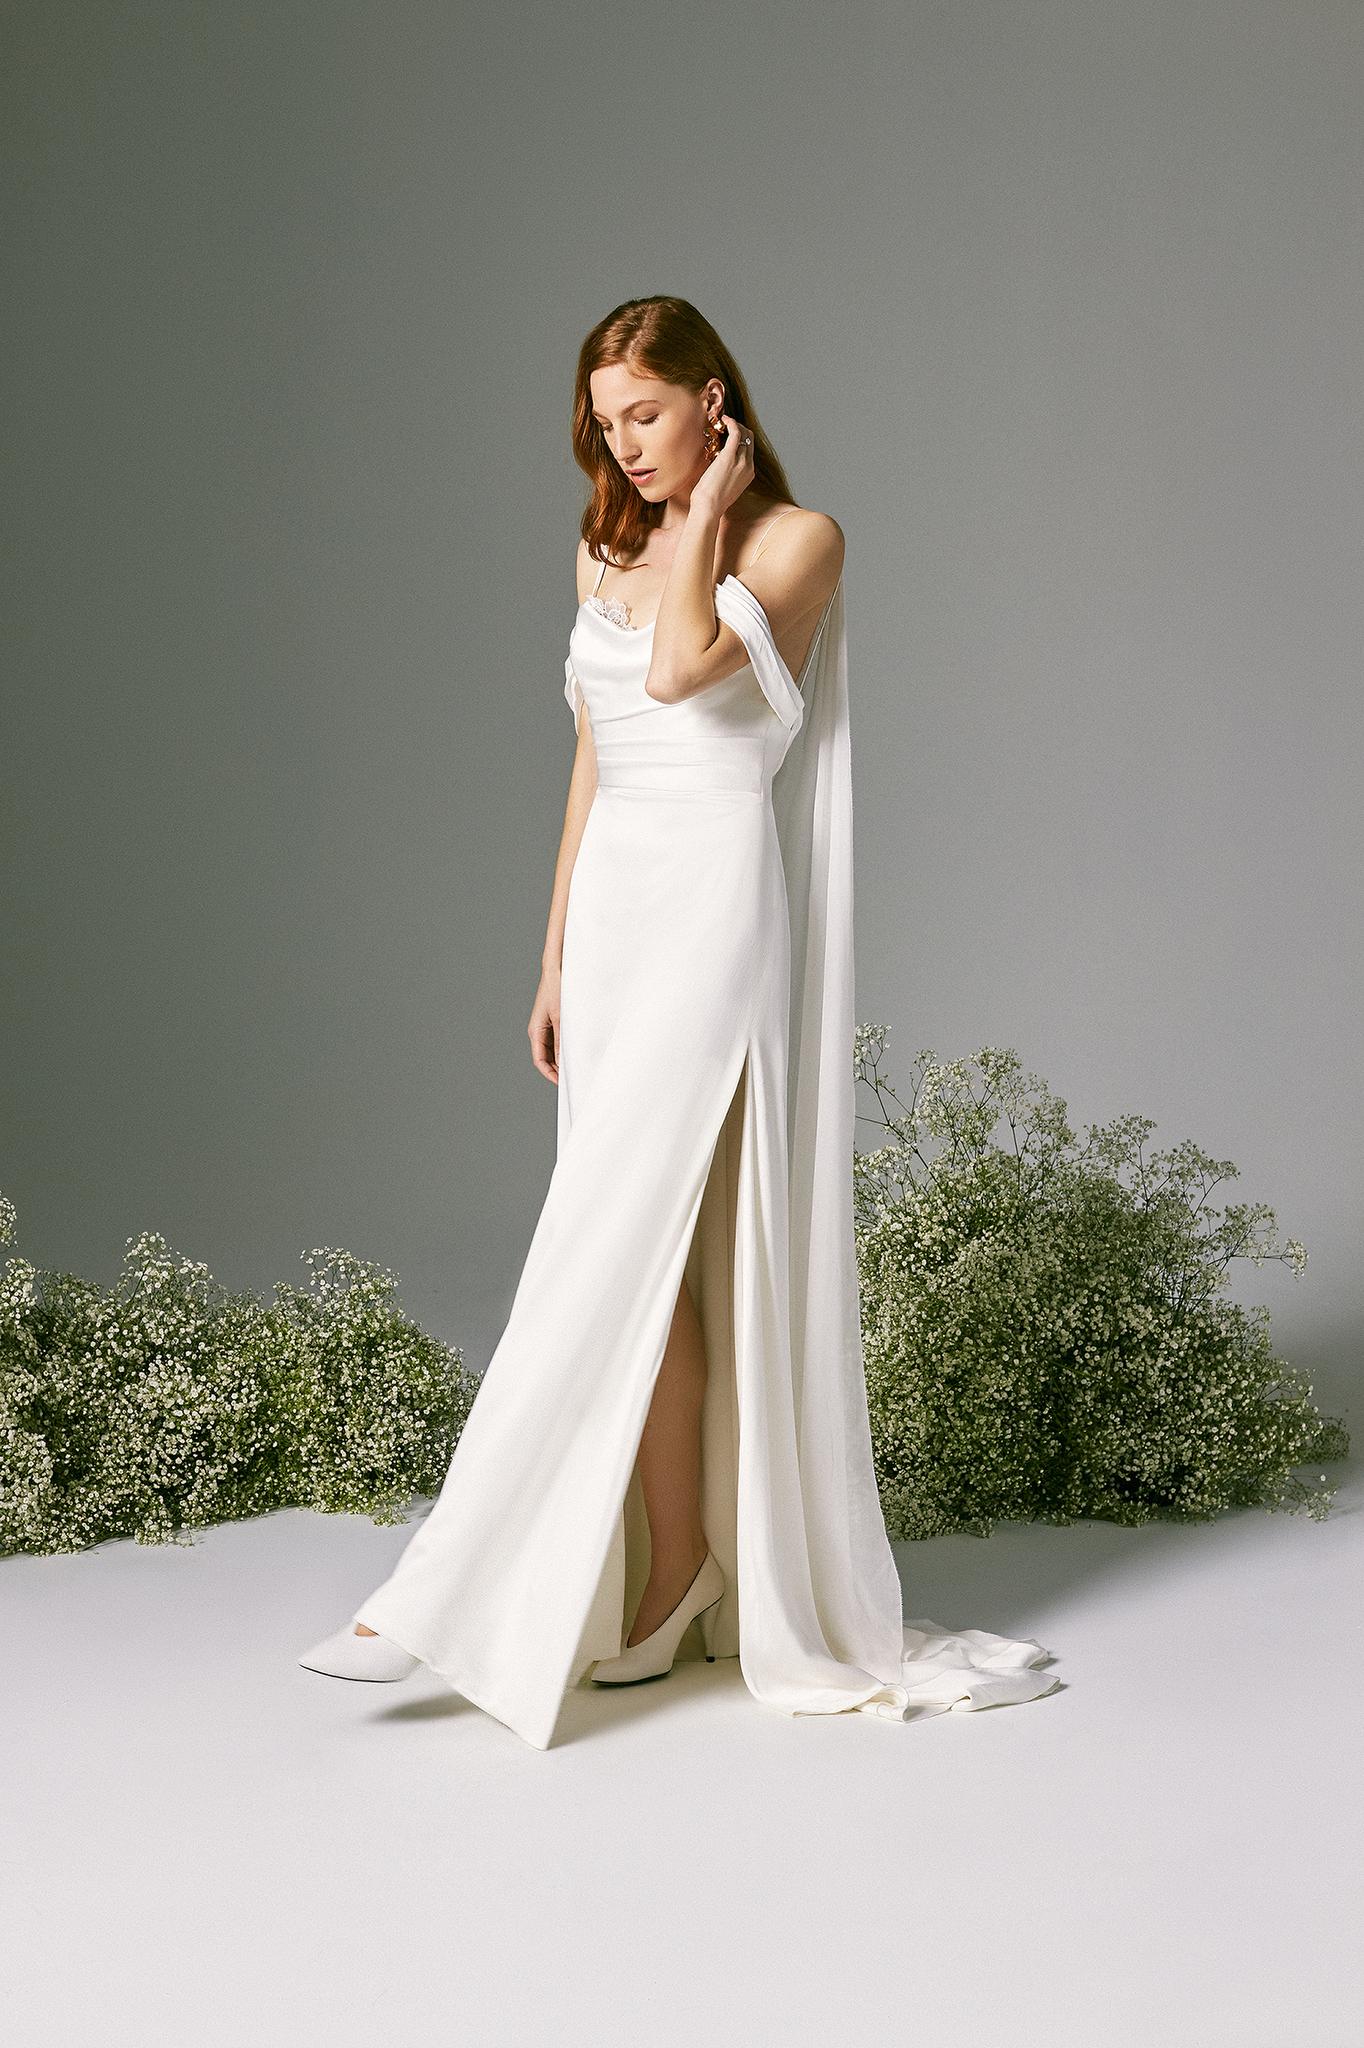 Savannah Miller Bridal Spring 2022